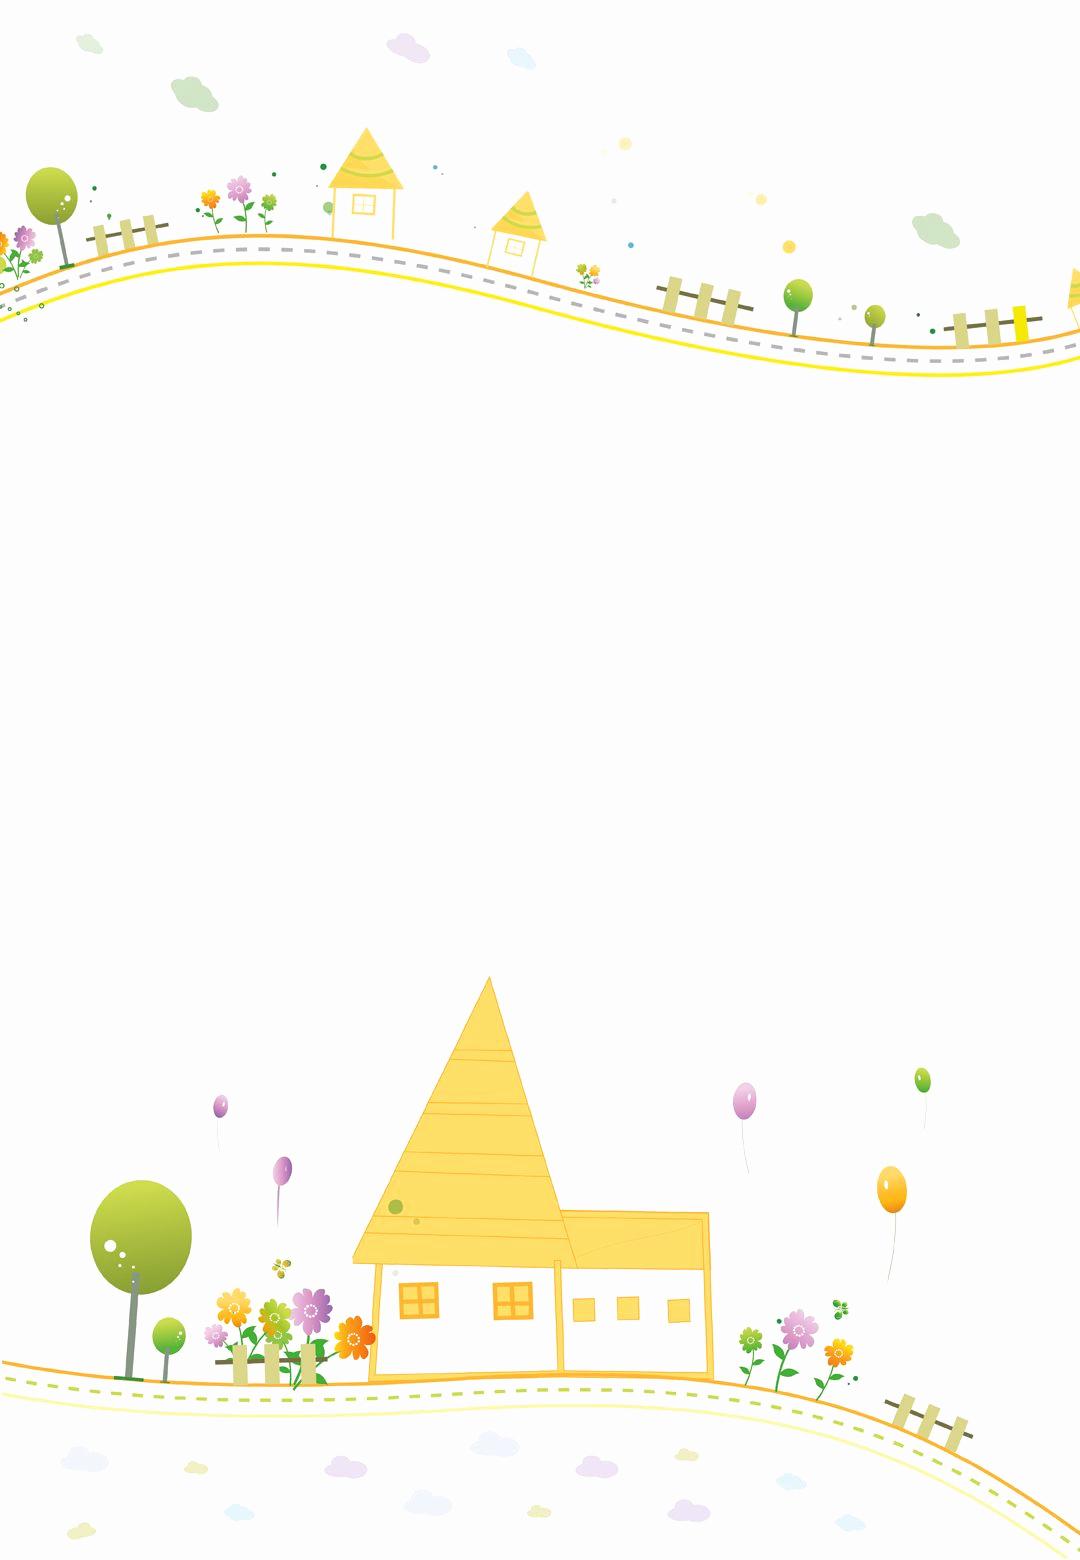 Housewarming Invitation Template Free New Housewarming Party Free Printable Housewarming